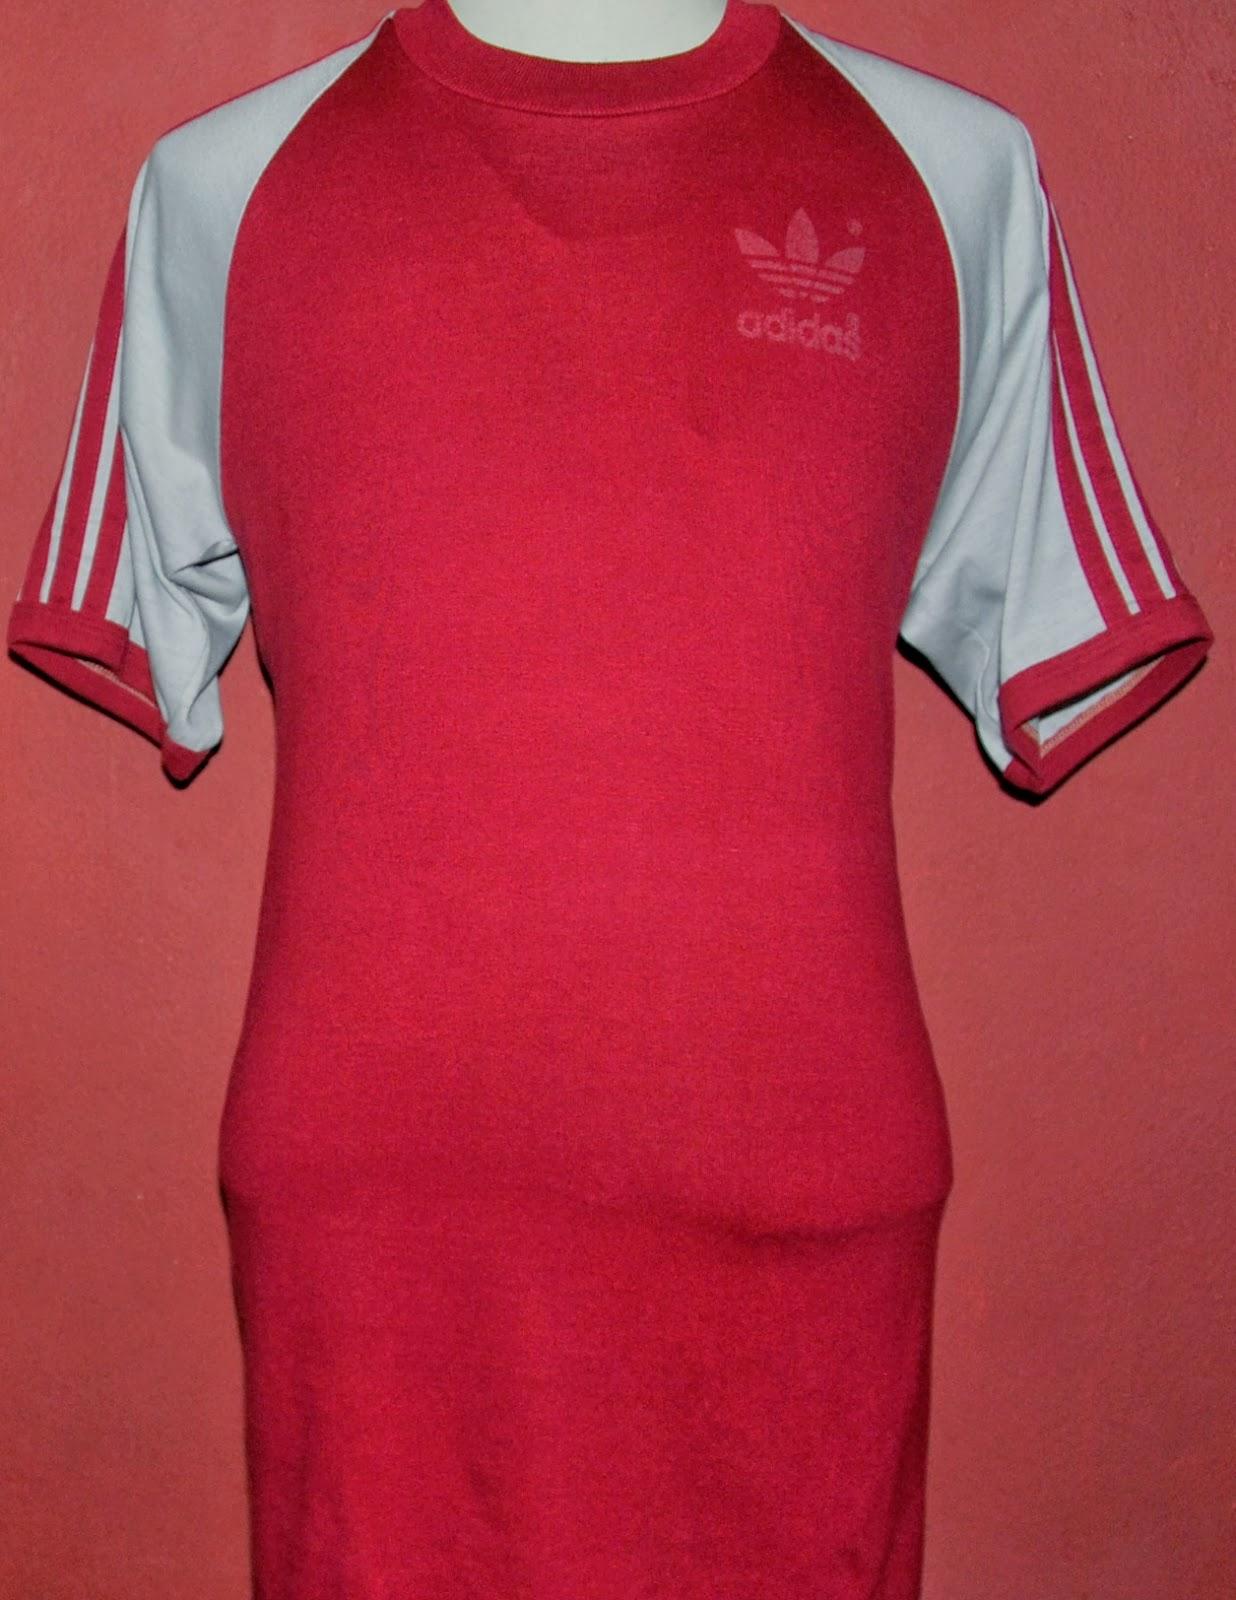 Kopa bundle vintage adidas 50 50 t shirt l for Adidas classic t shirt